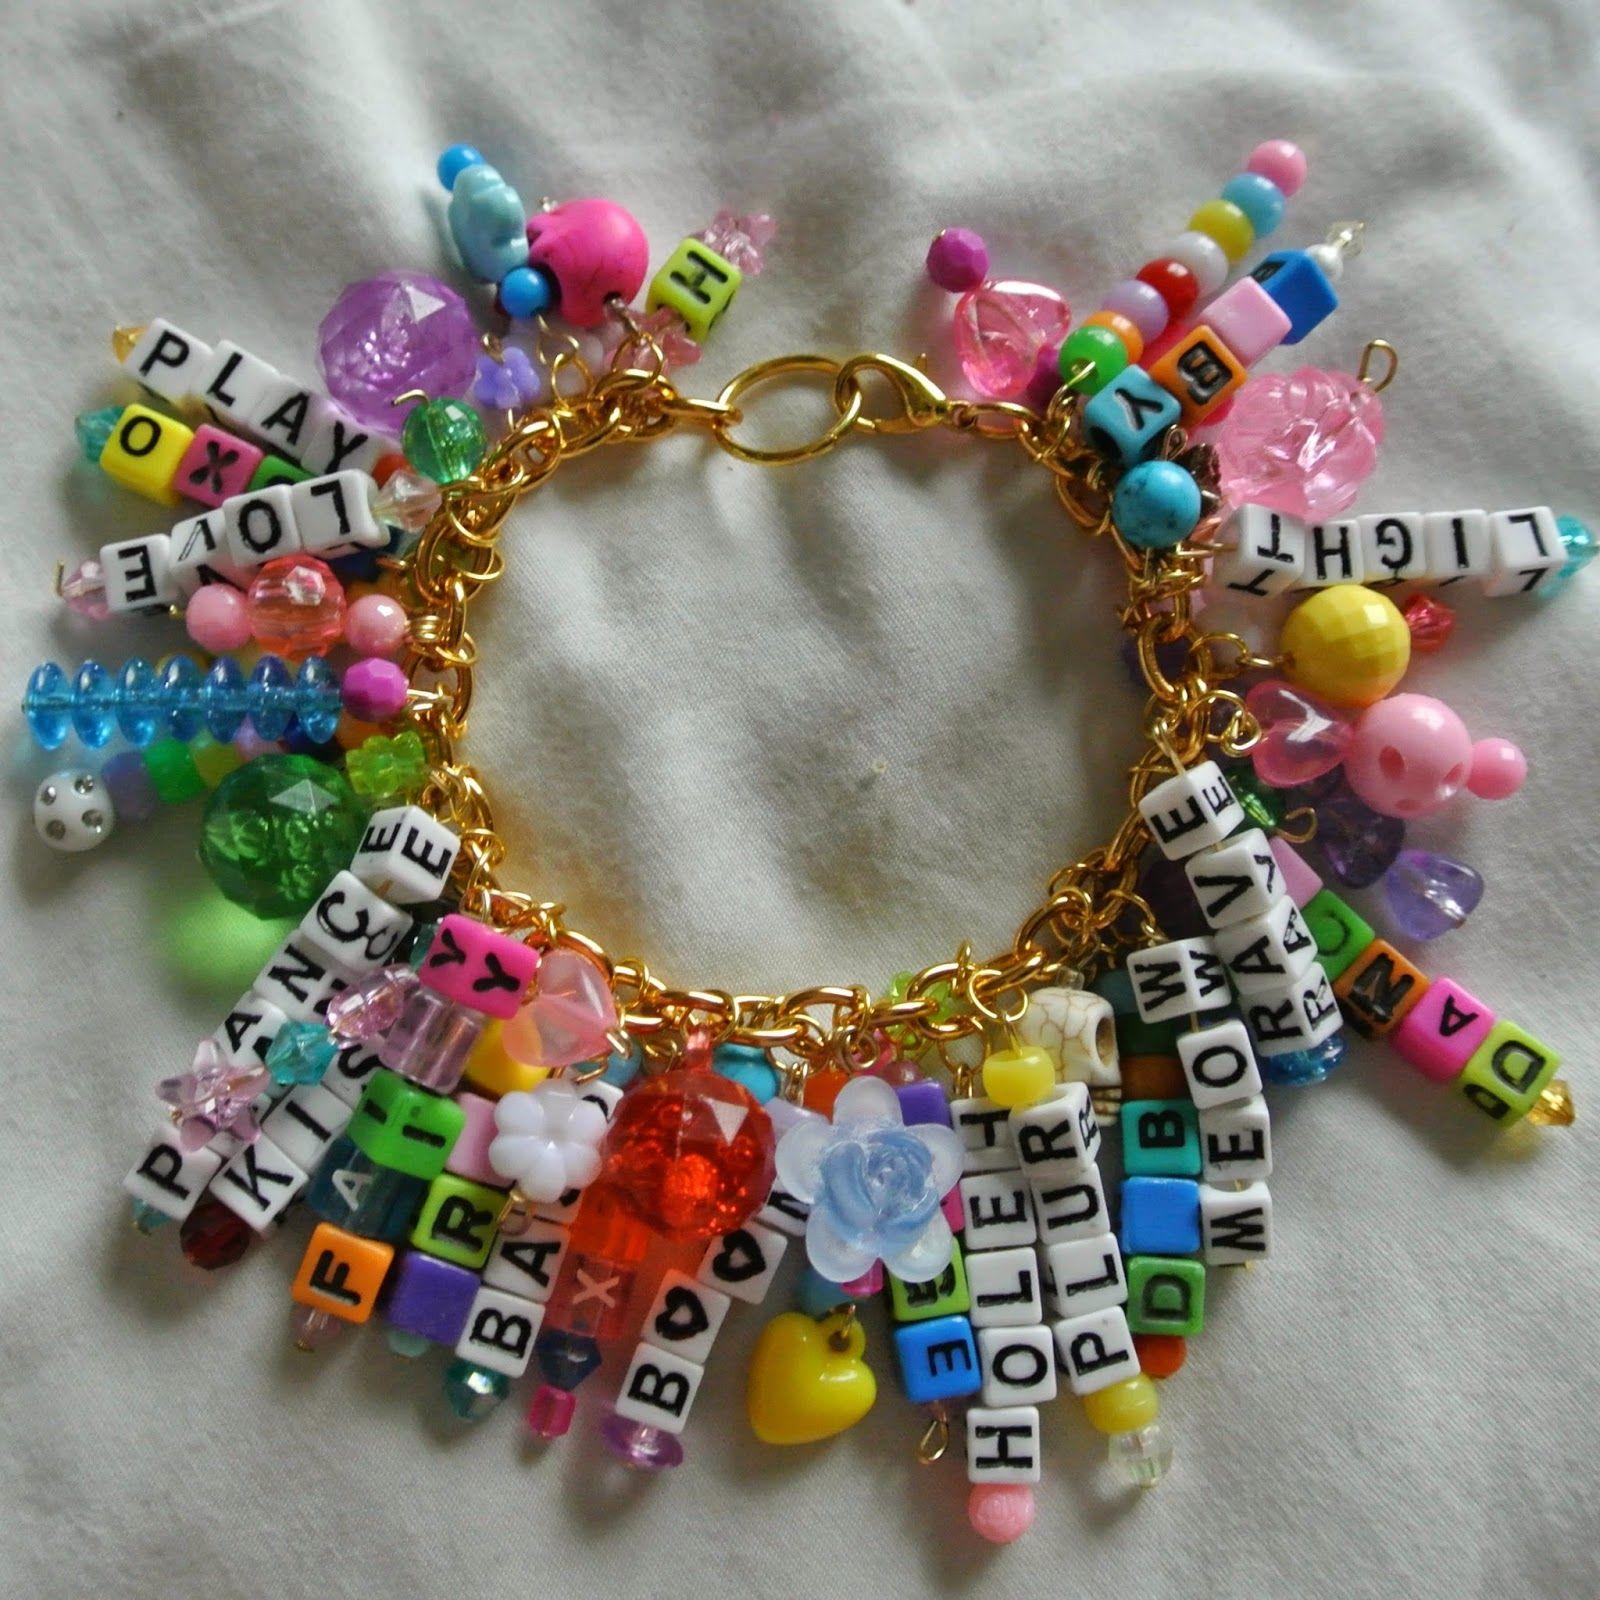 Charm Bracelet Ideas: Kandi Charm! #plur #Dancefestopia #Kandi